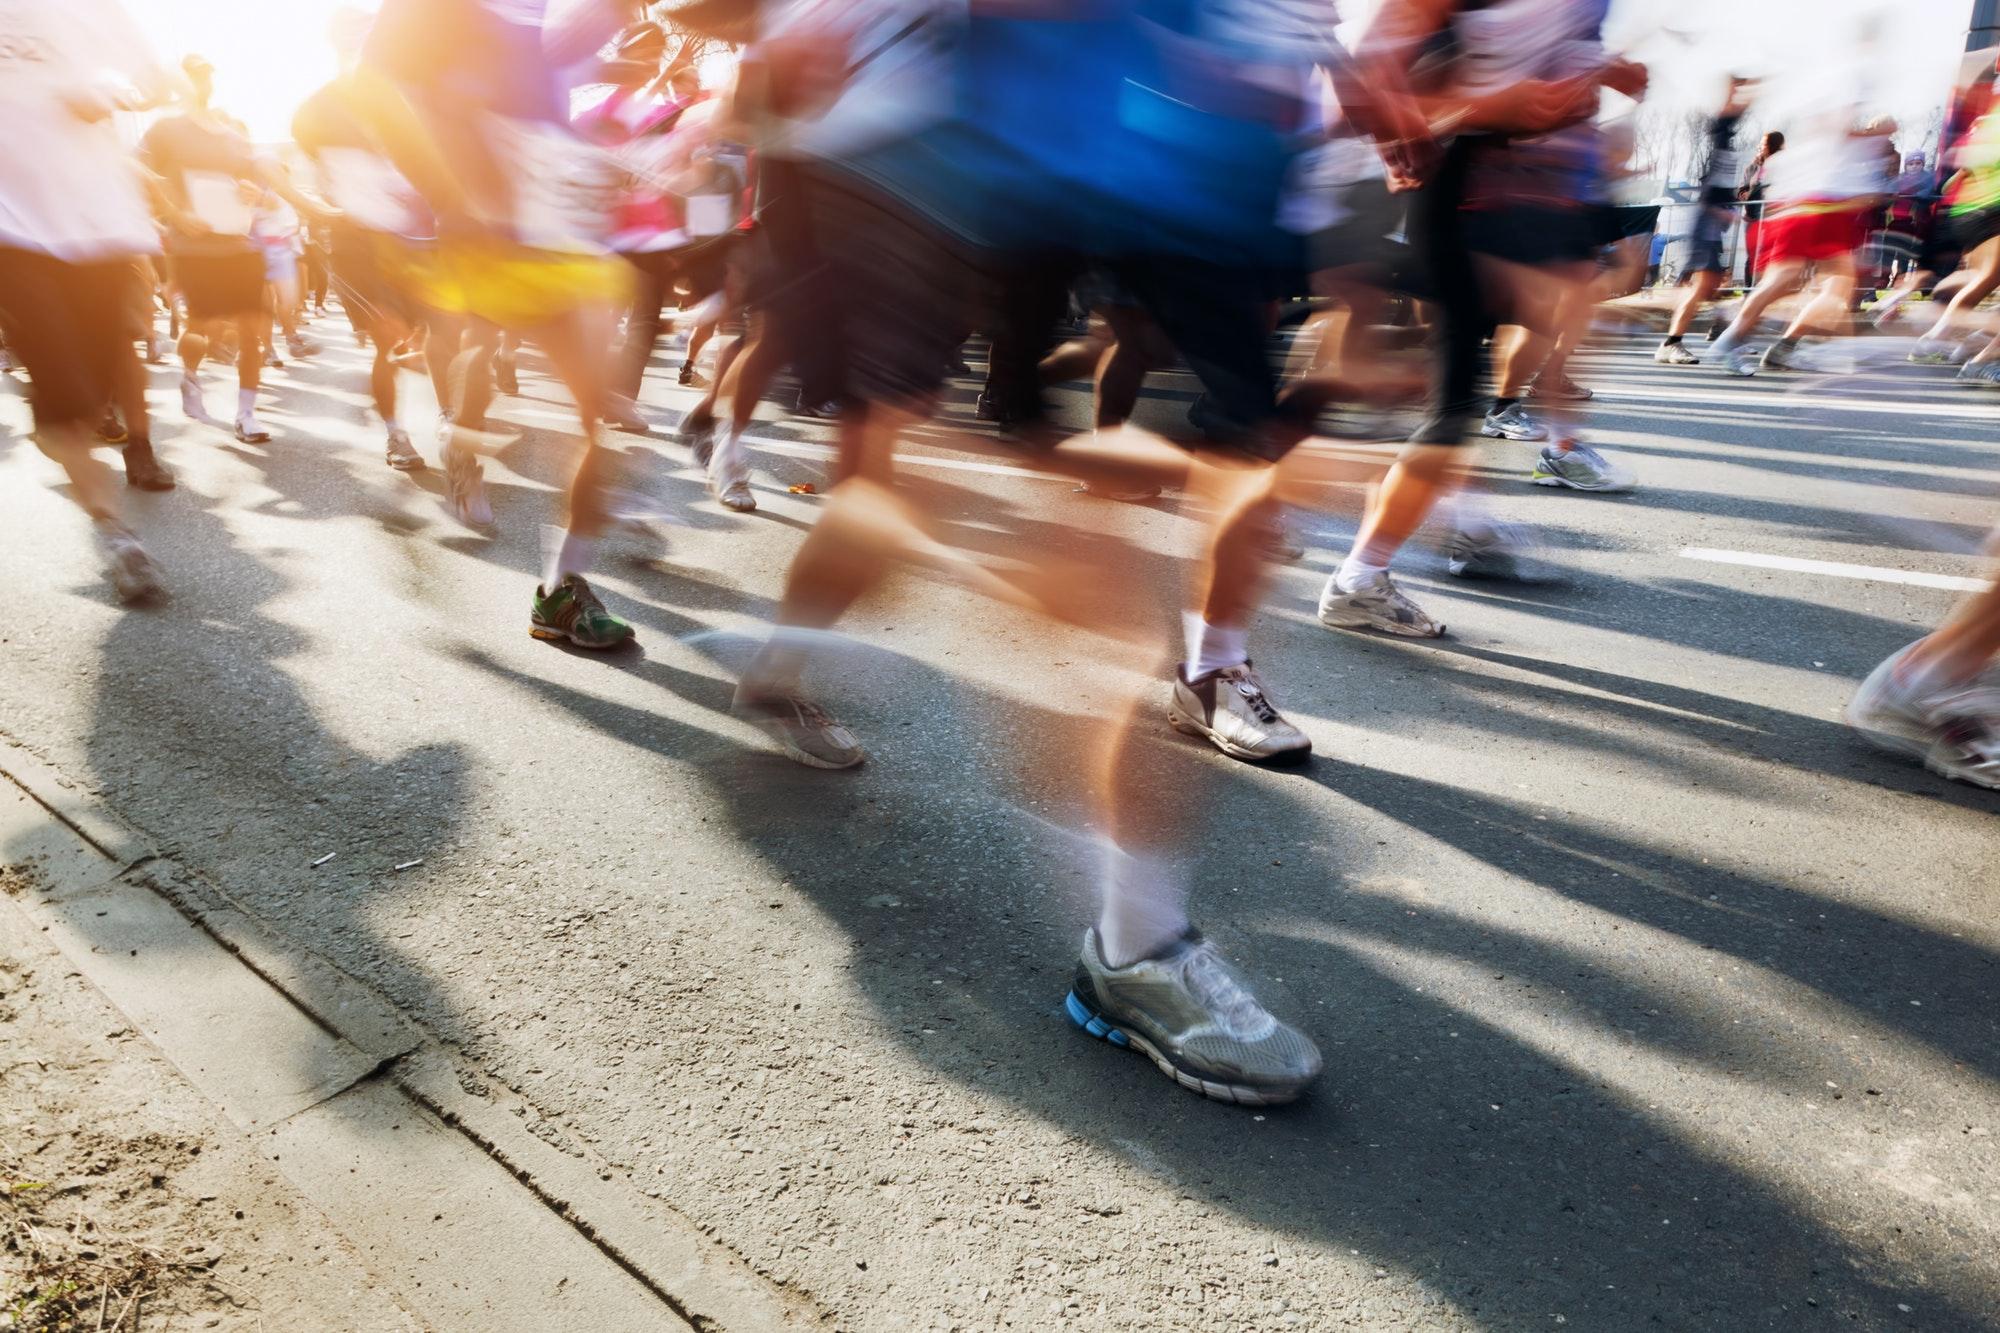 Marathon runners in motion. Running